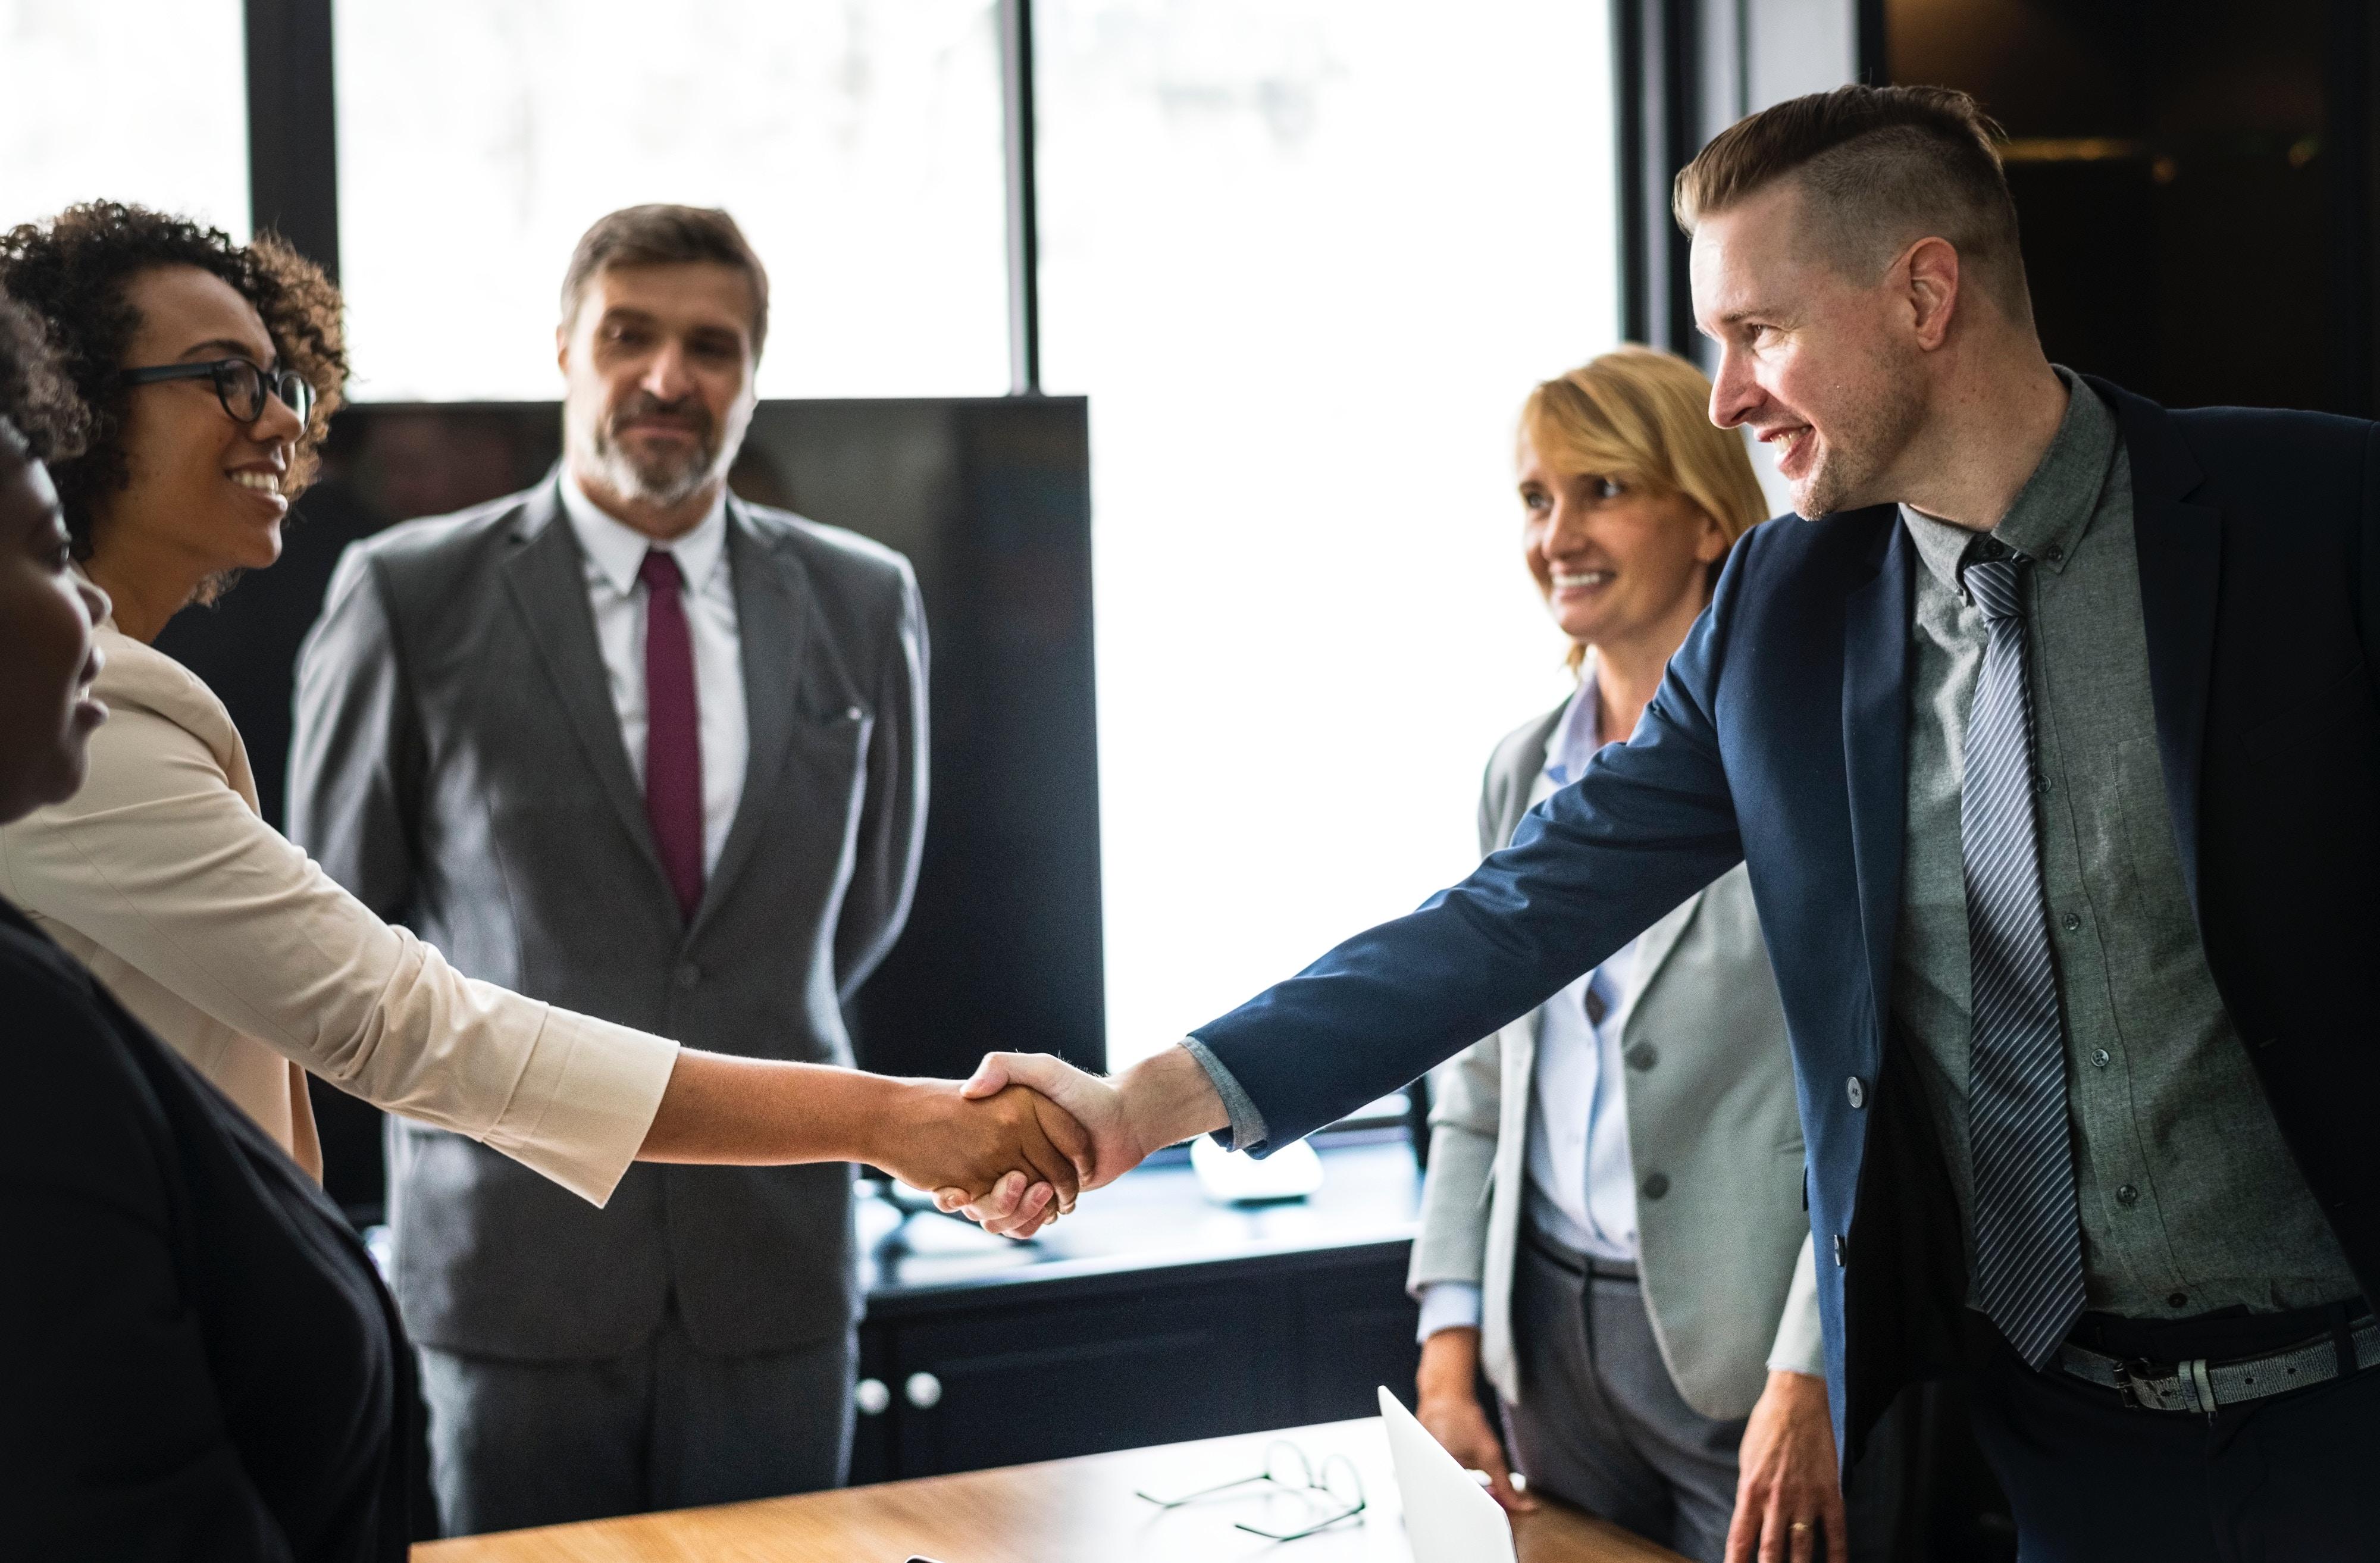 Clip: Broker Dealer & Advisor Acceptance